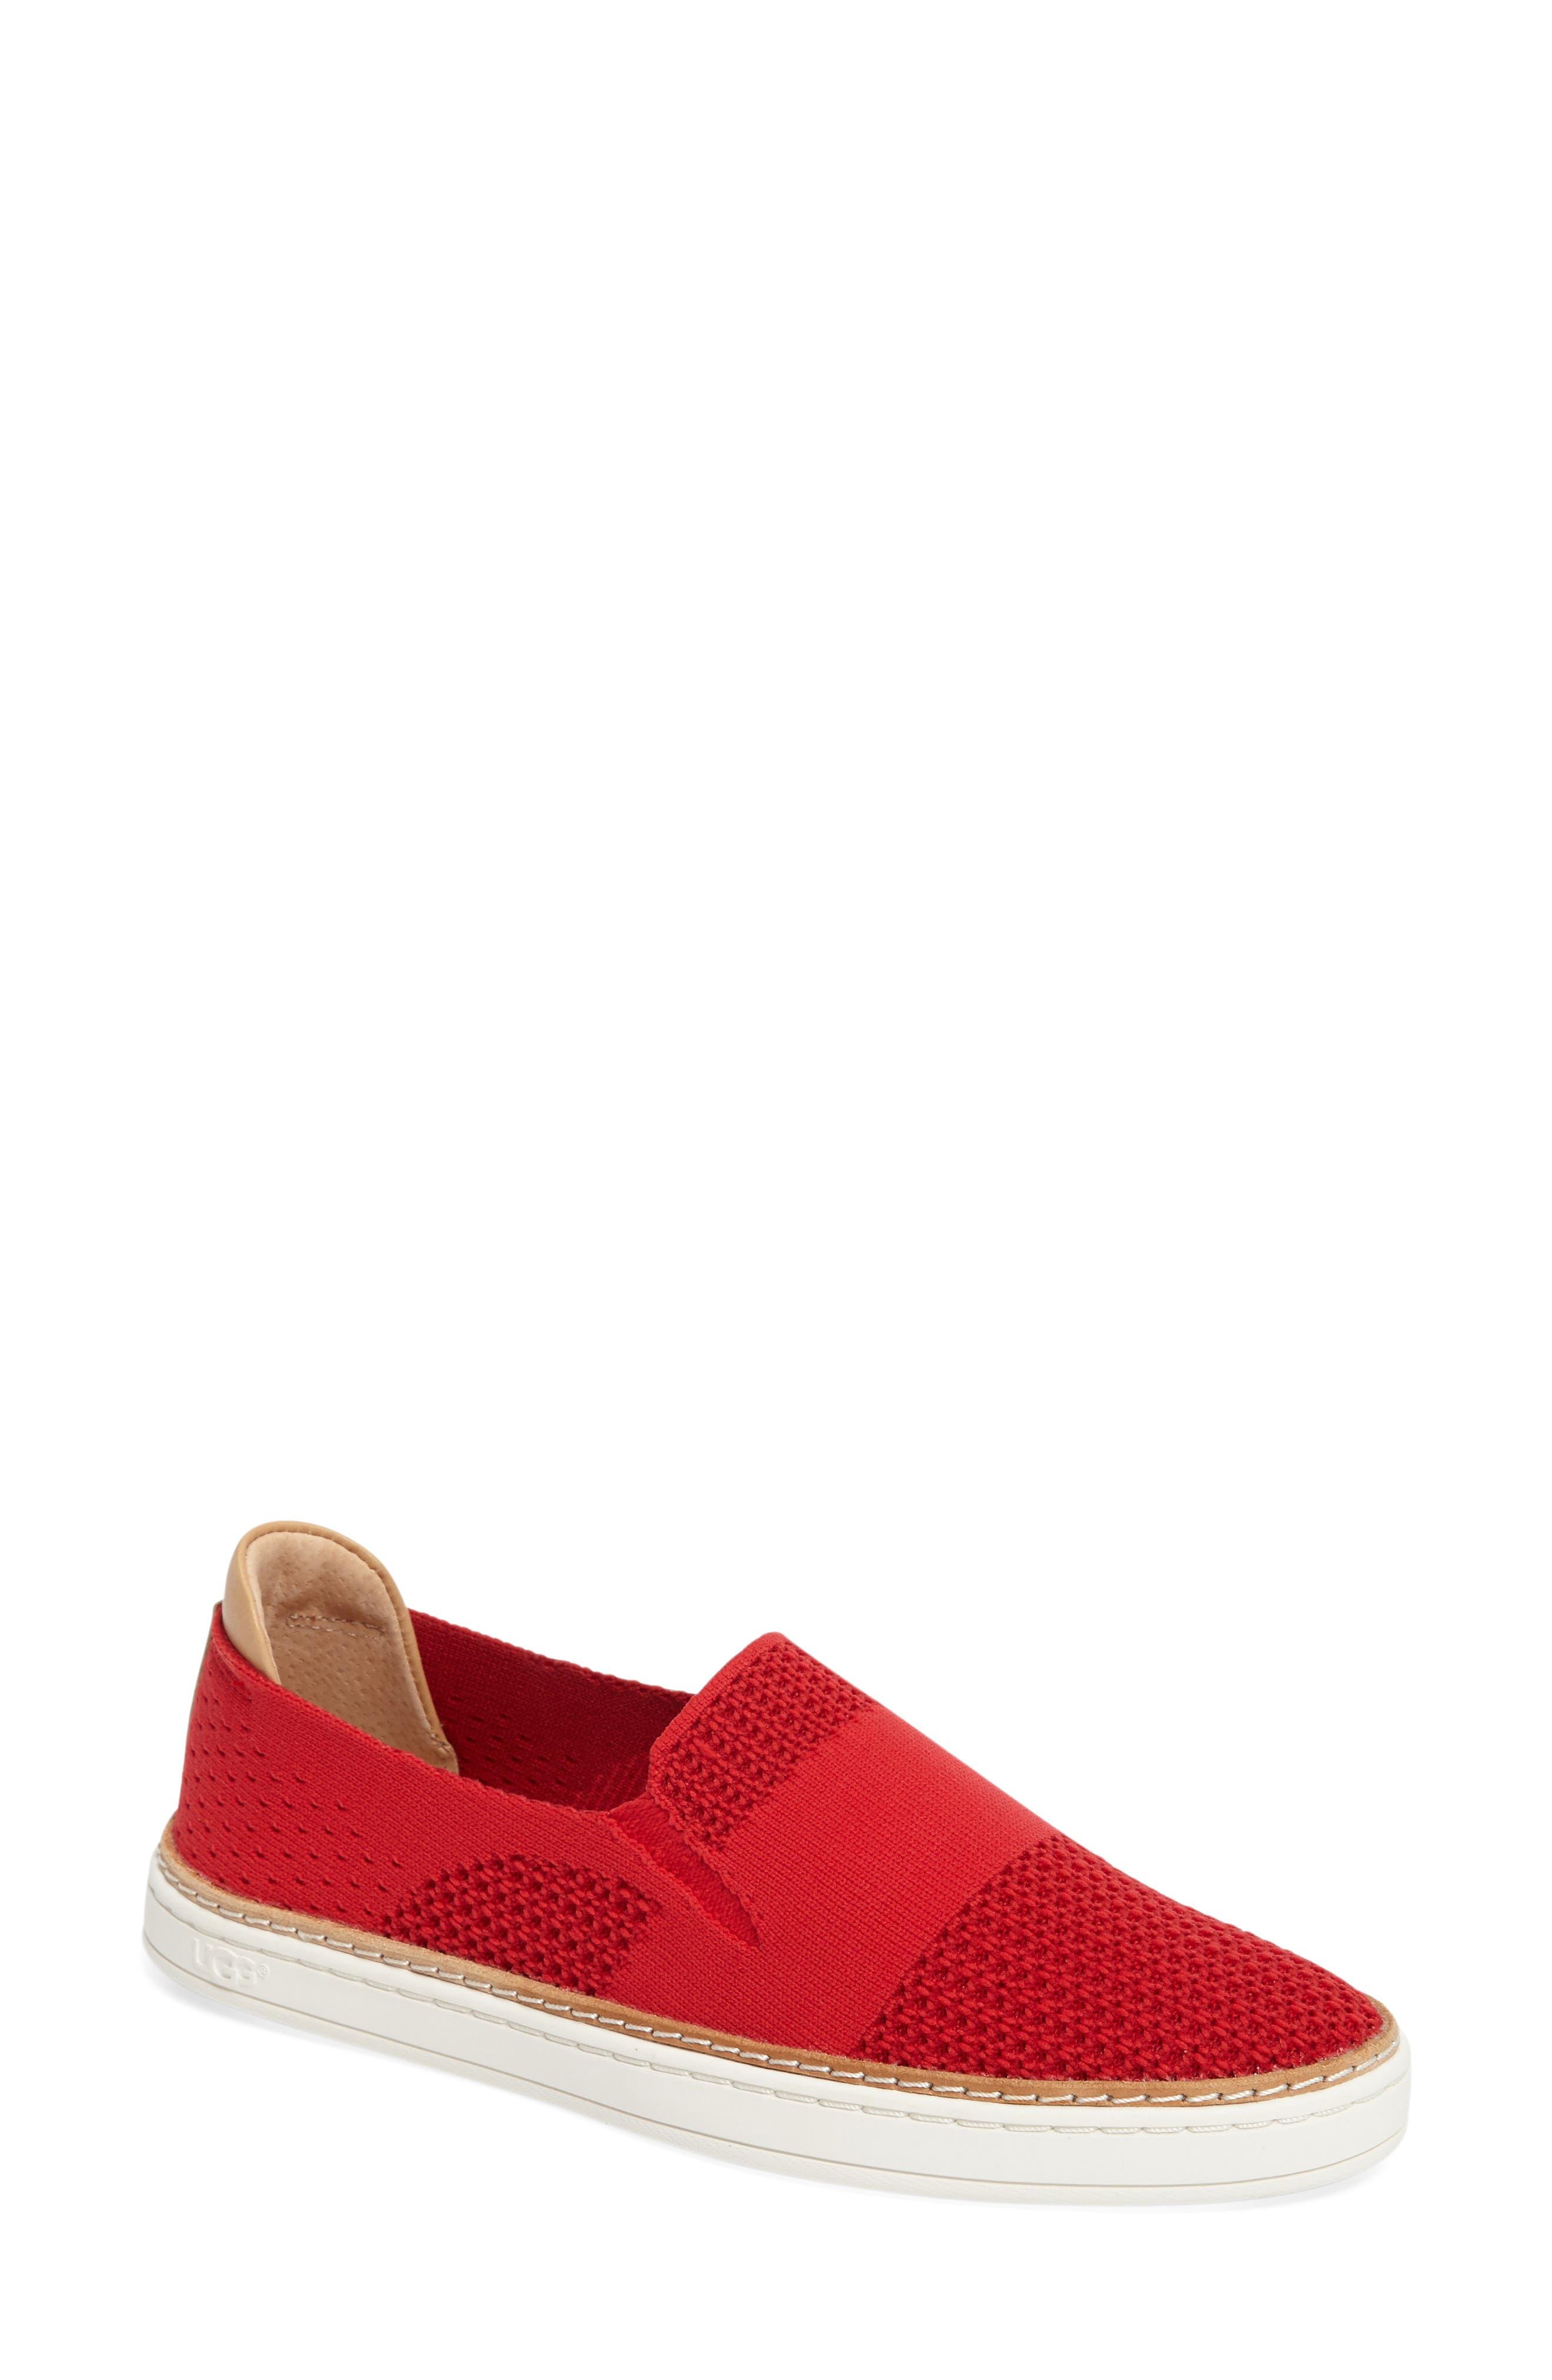 Sneakers for Women On Sale, Milk, Leather, 2017, 3 3.5 5.5 6 Giuseppe Zanotti